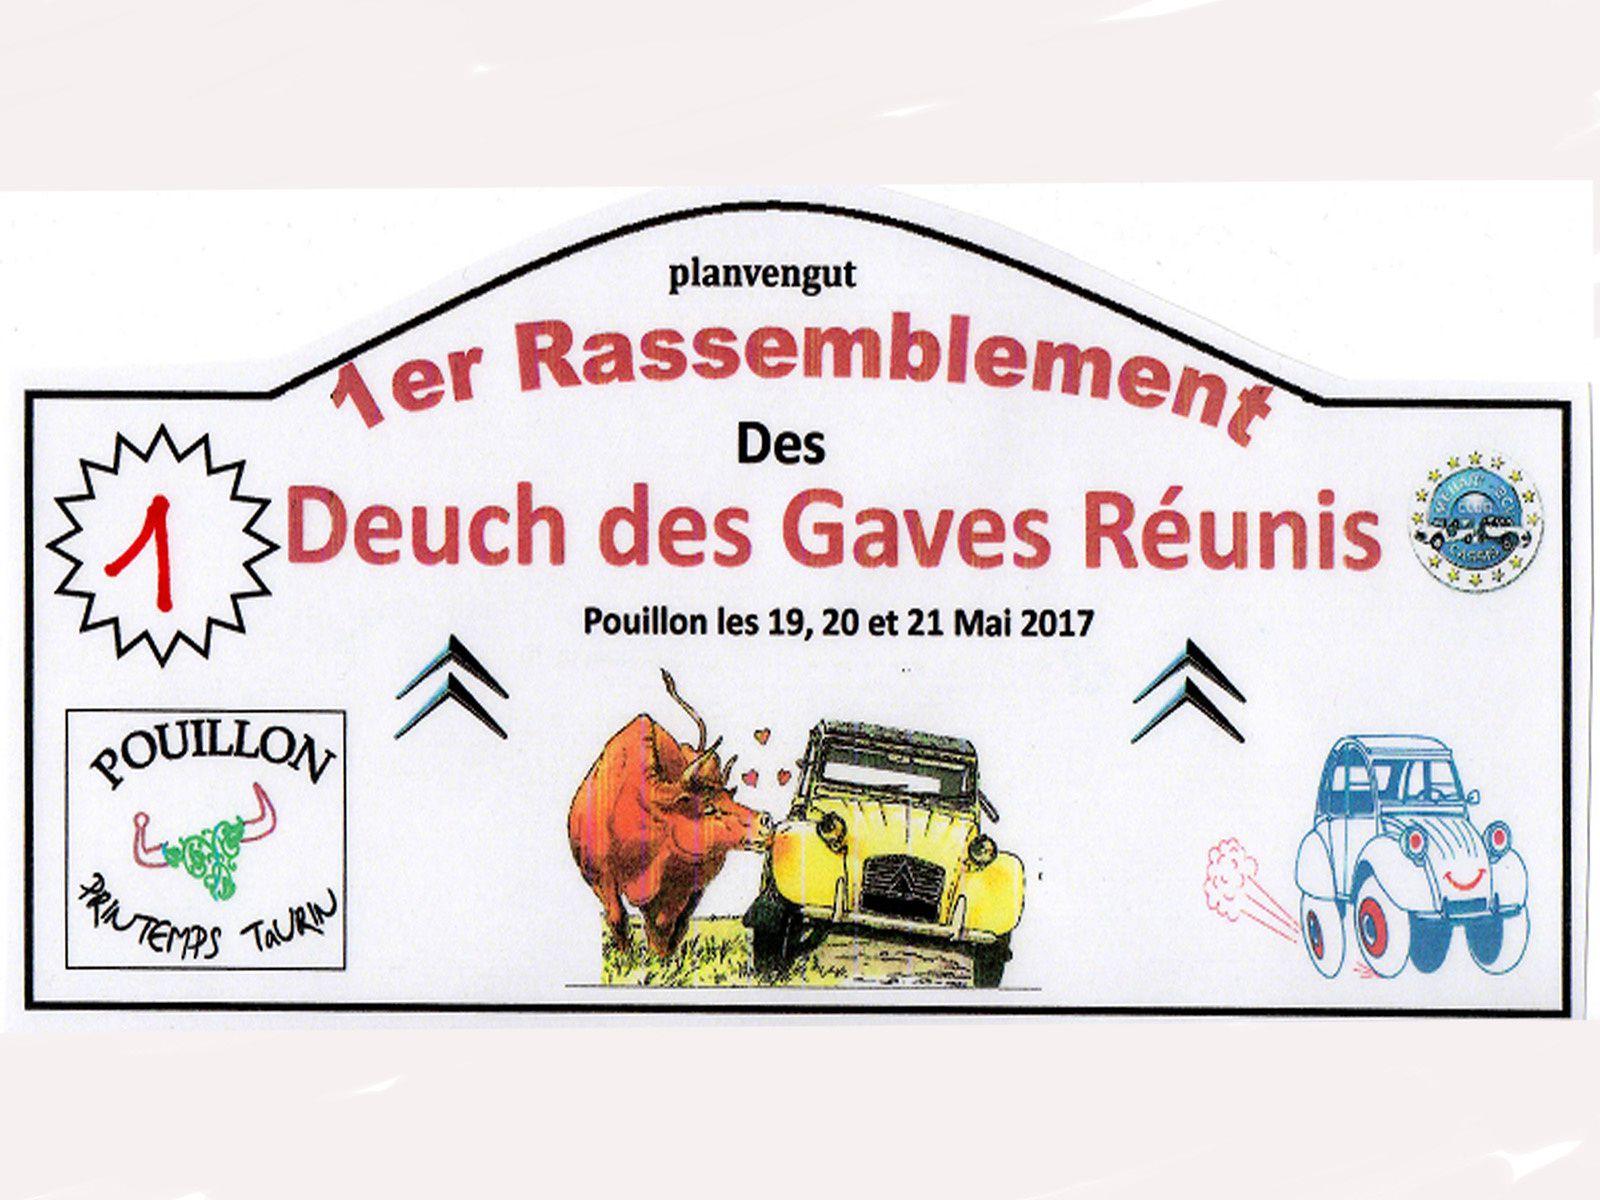 1er RASSEMBLEMENT DU CLUB DES GAVES REUNIS